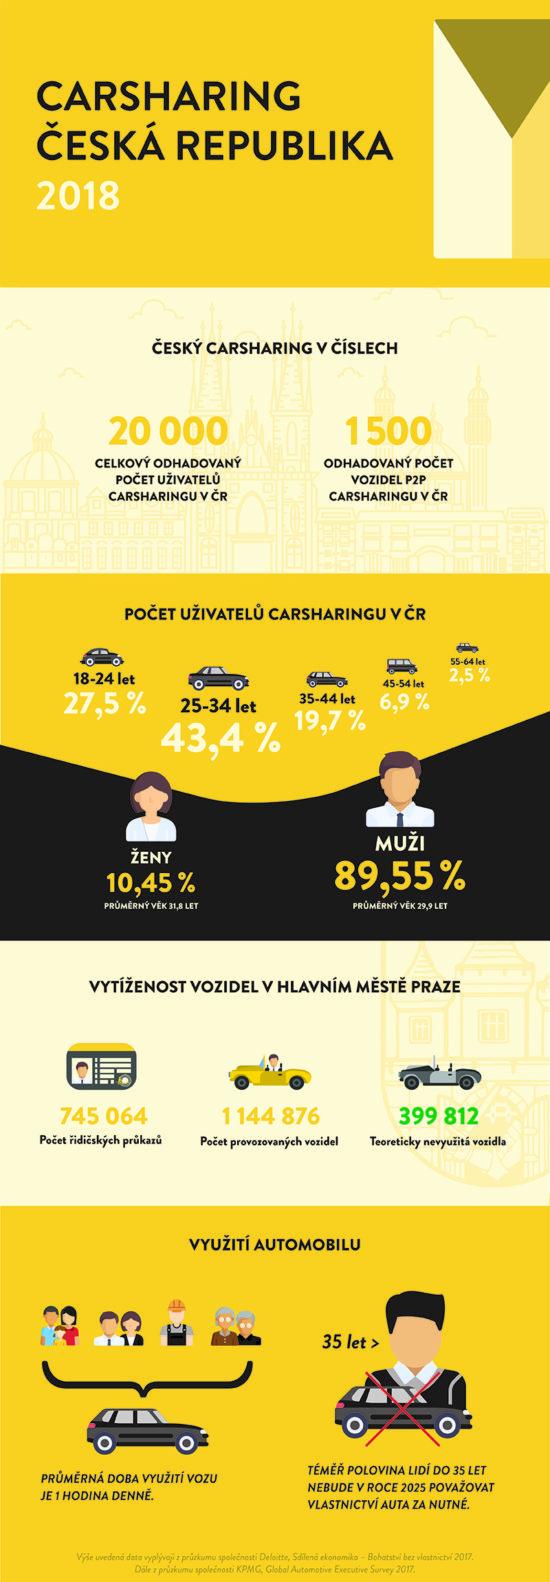 Jak je na tom carsharing v Česku?